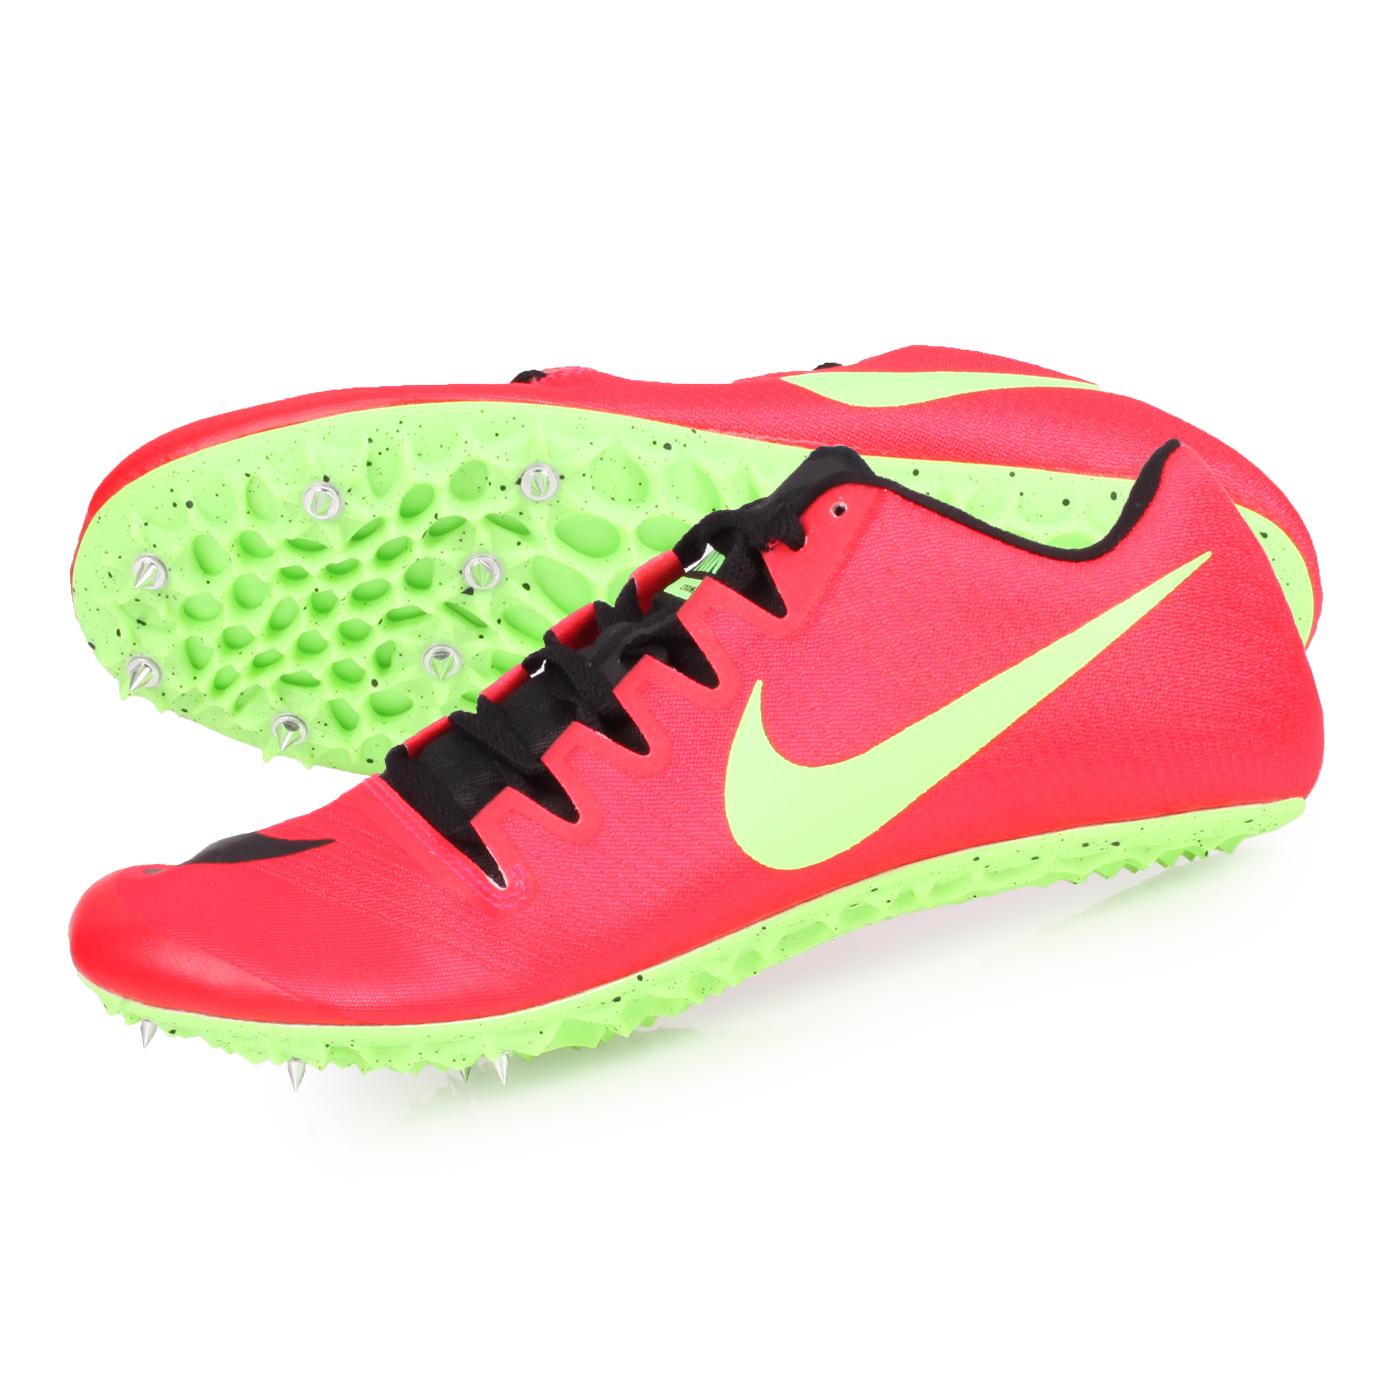 NIKE 田徑釘鞋(短距離)  @ZOOM JA FLY 3@865633001 - 紅黑綠